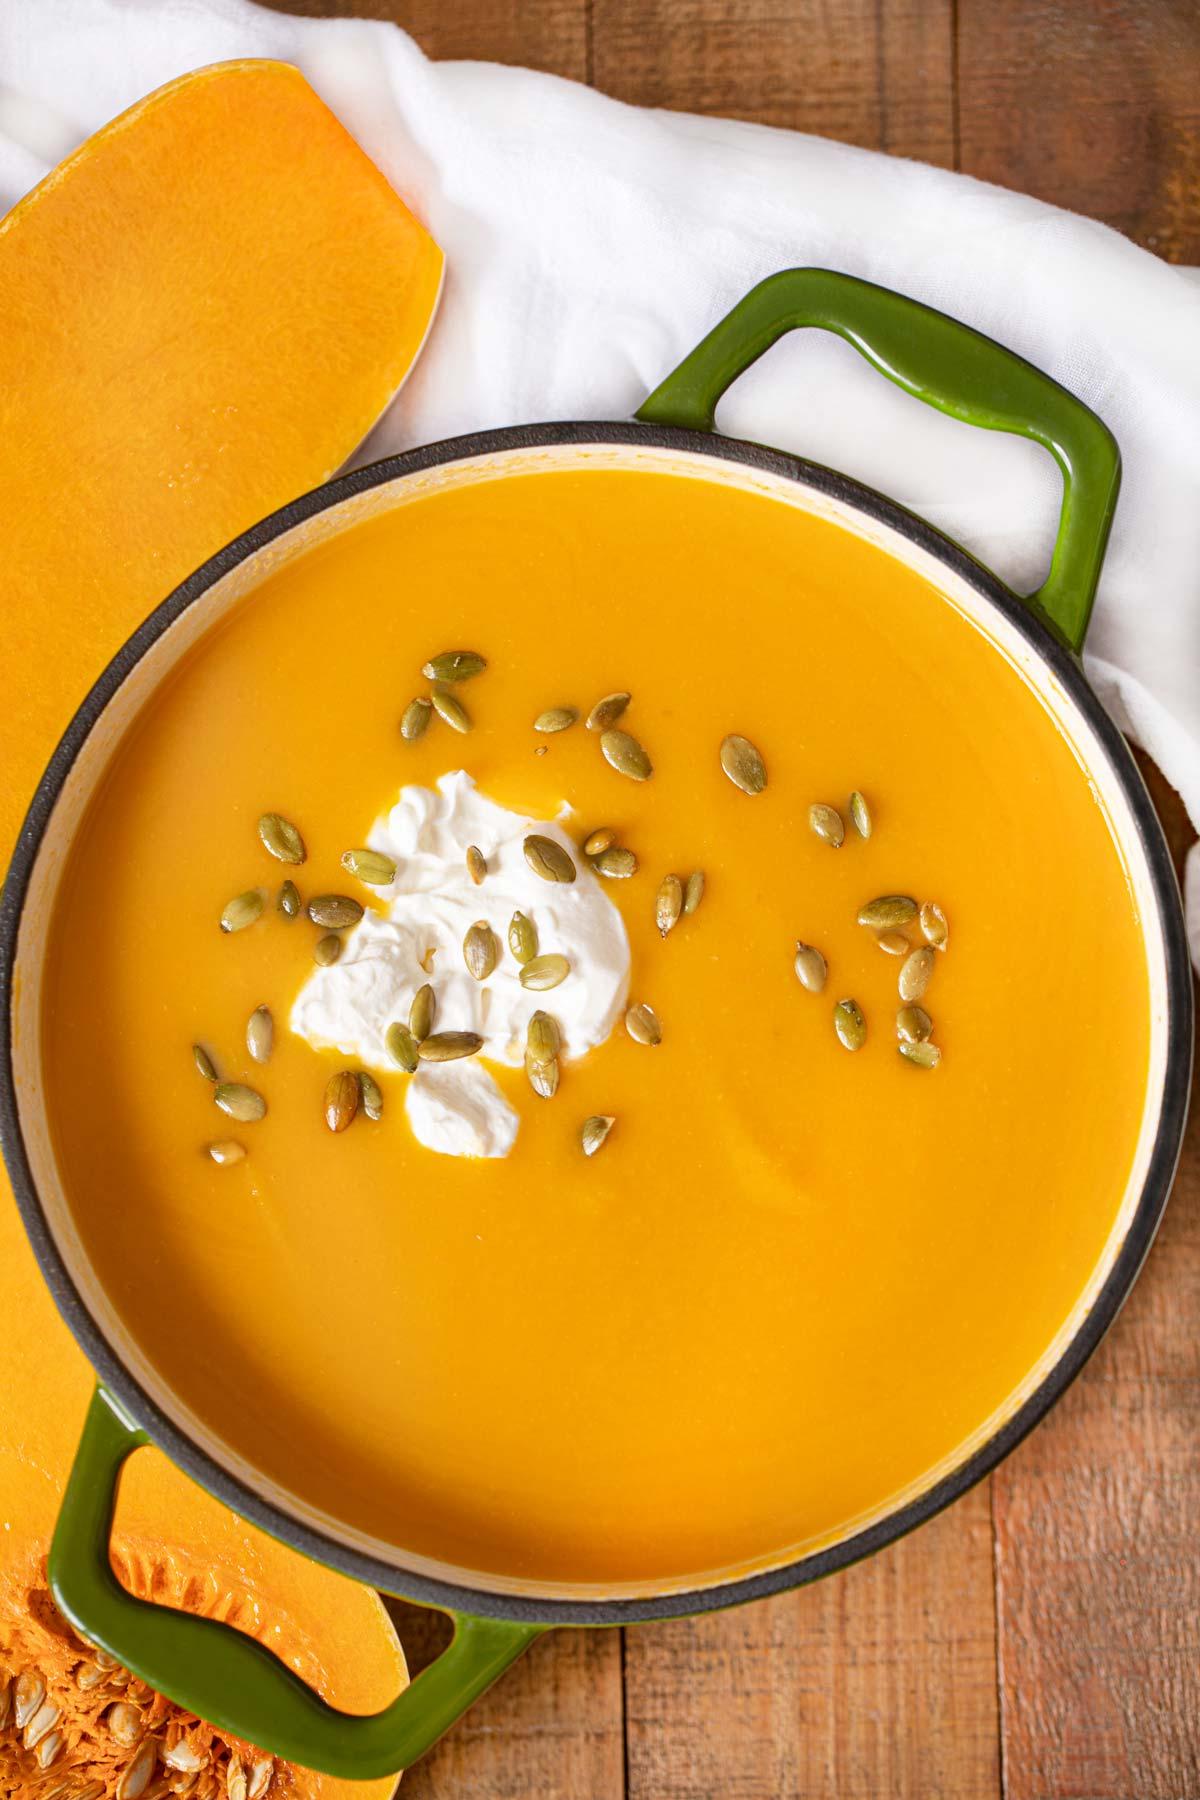 Pot of Butternut Squash Soup